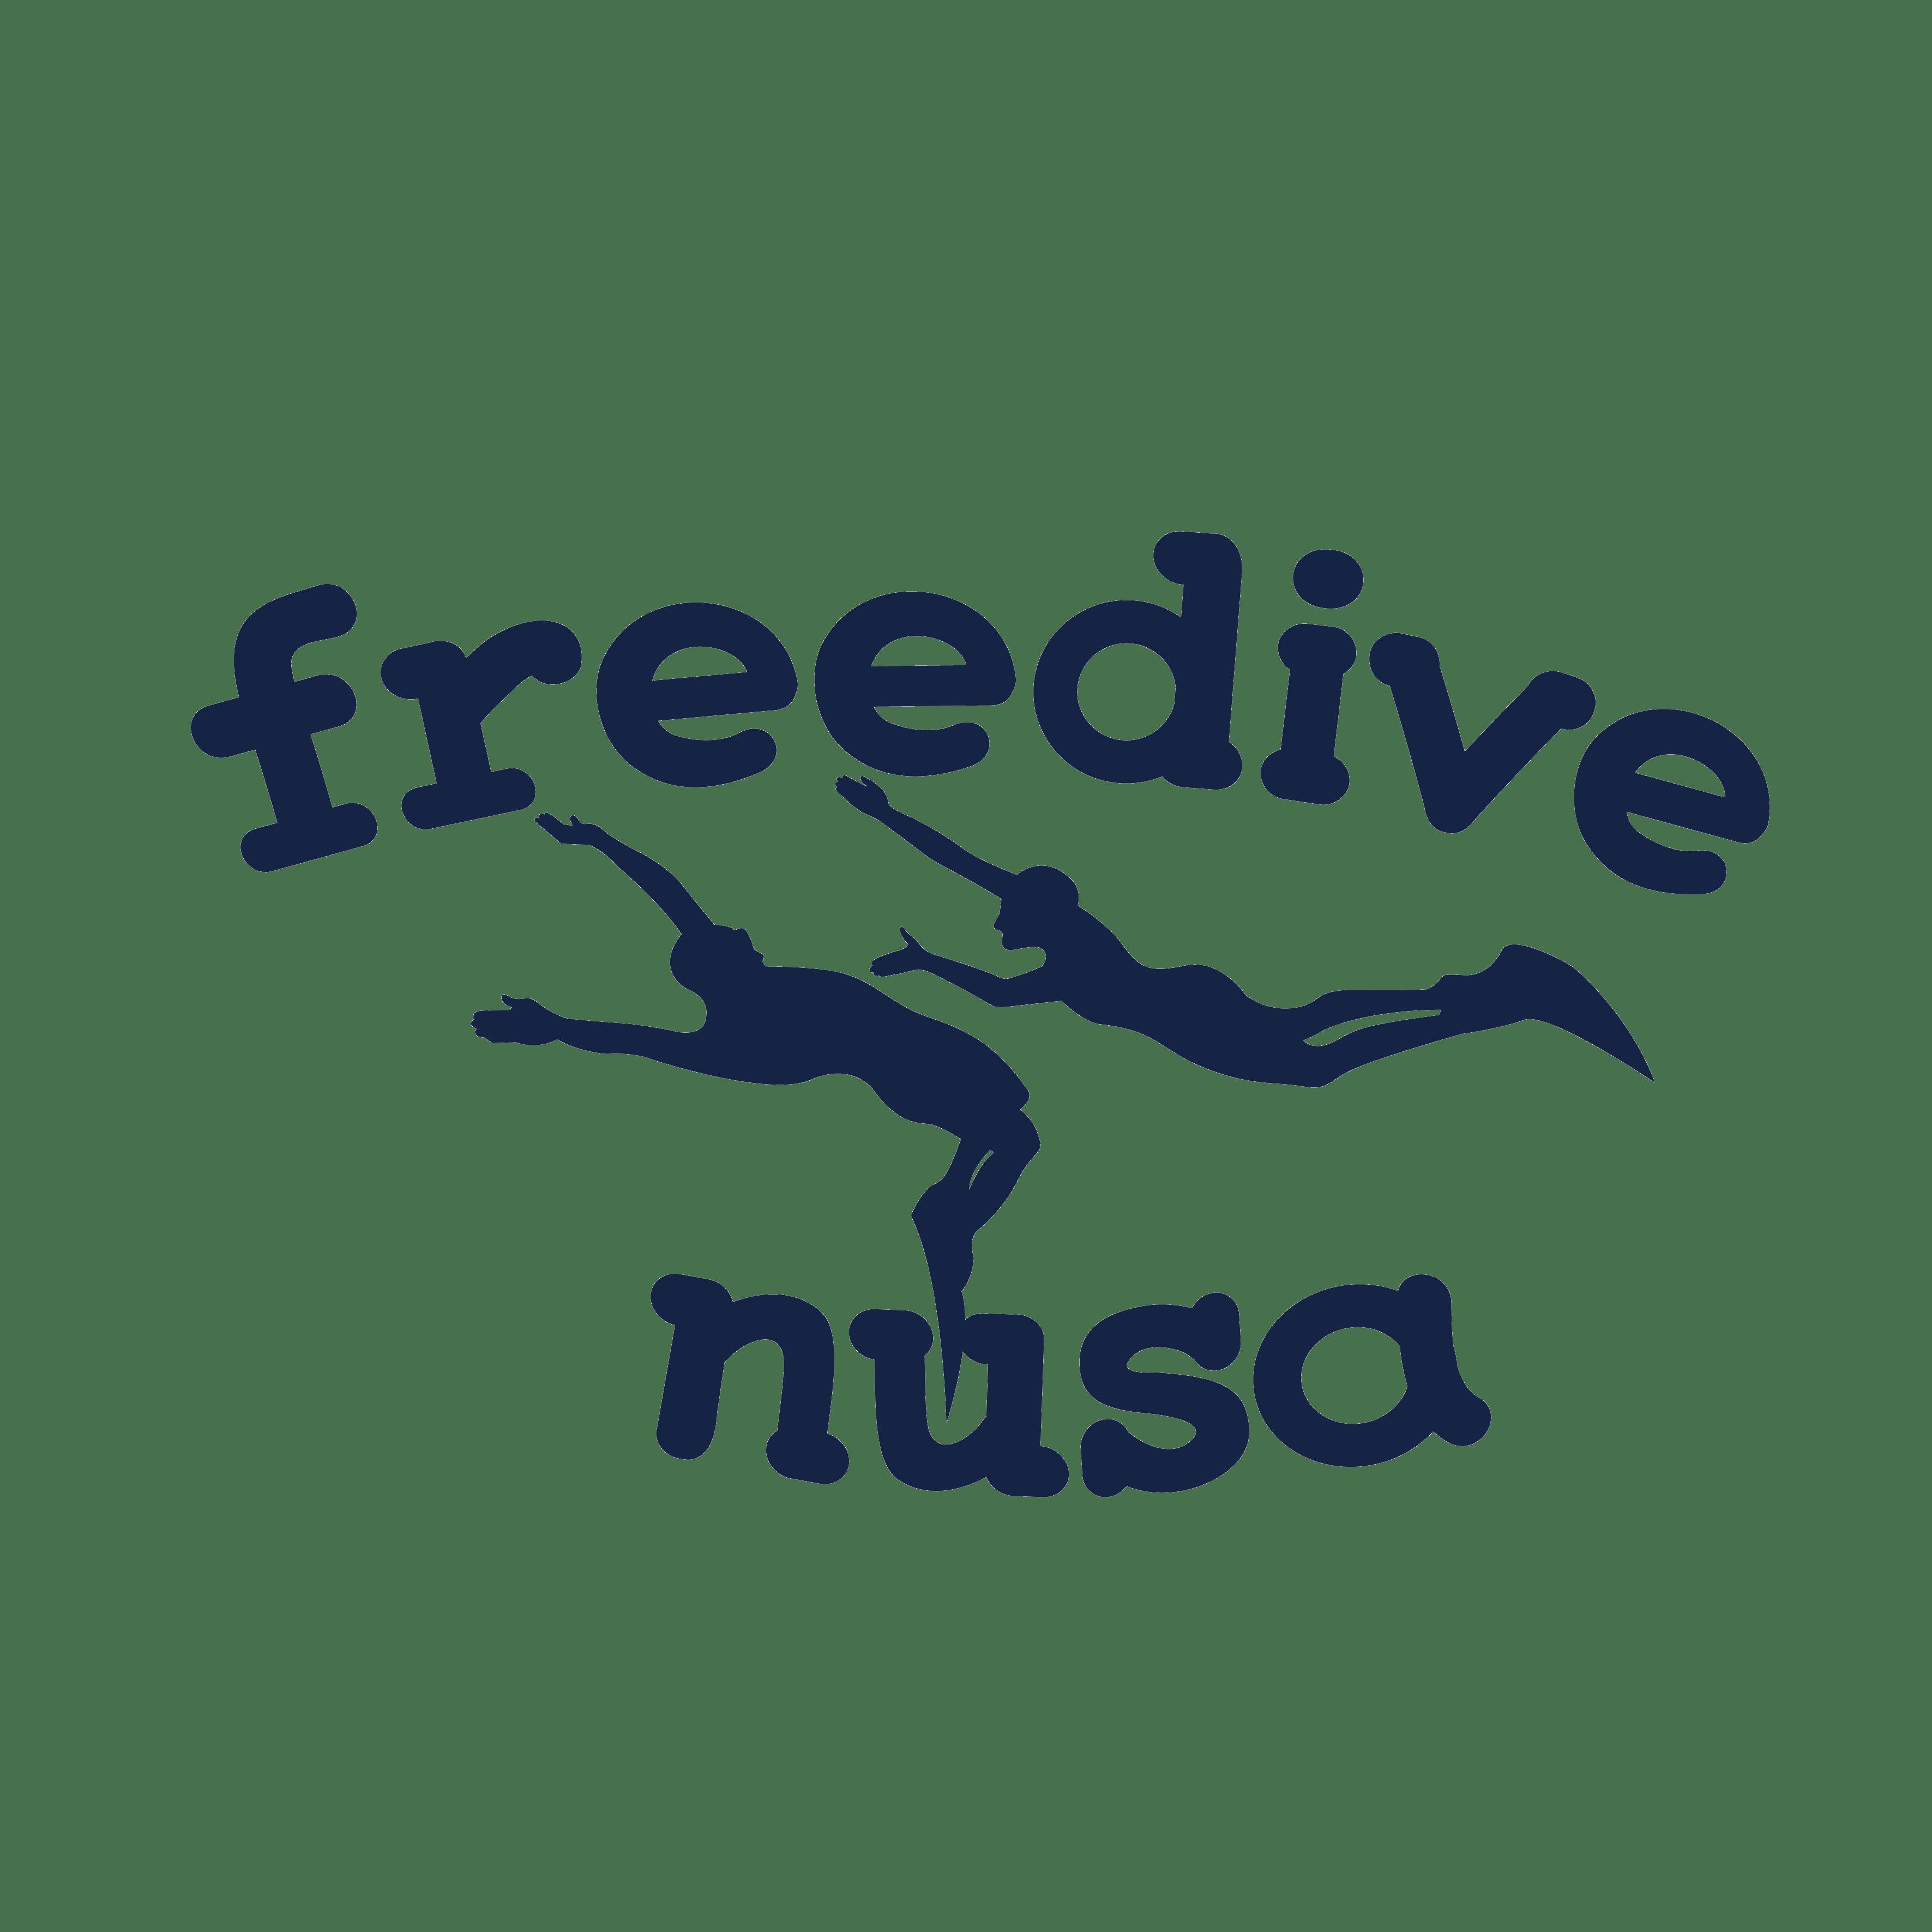 Freedive Nusa — русская школа фридайвинга на Бали